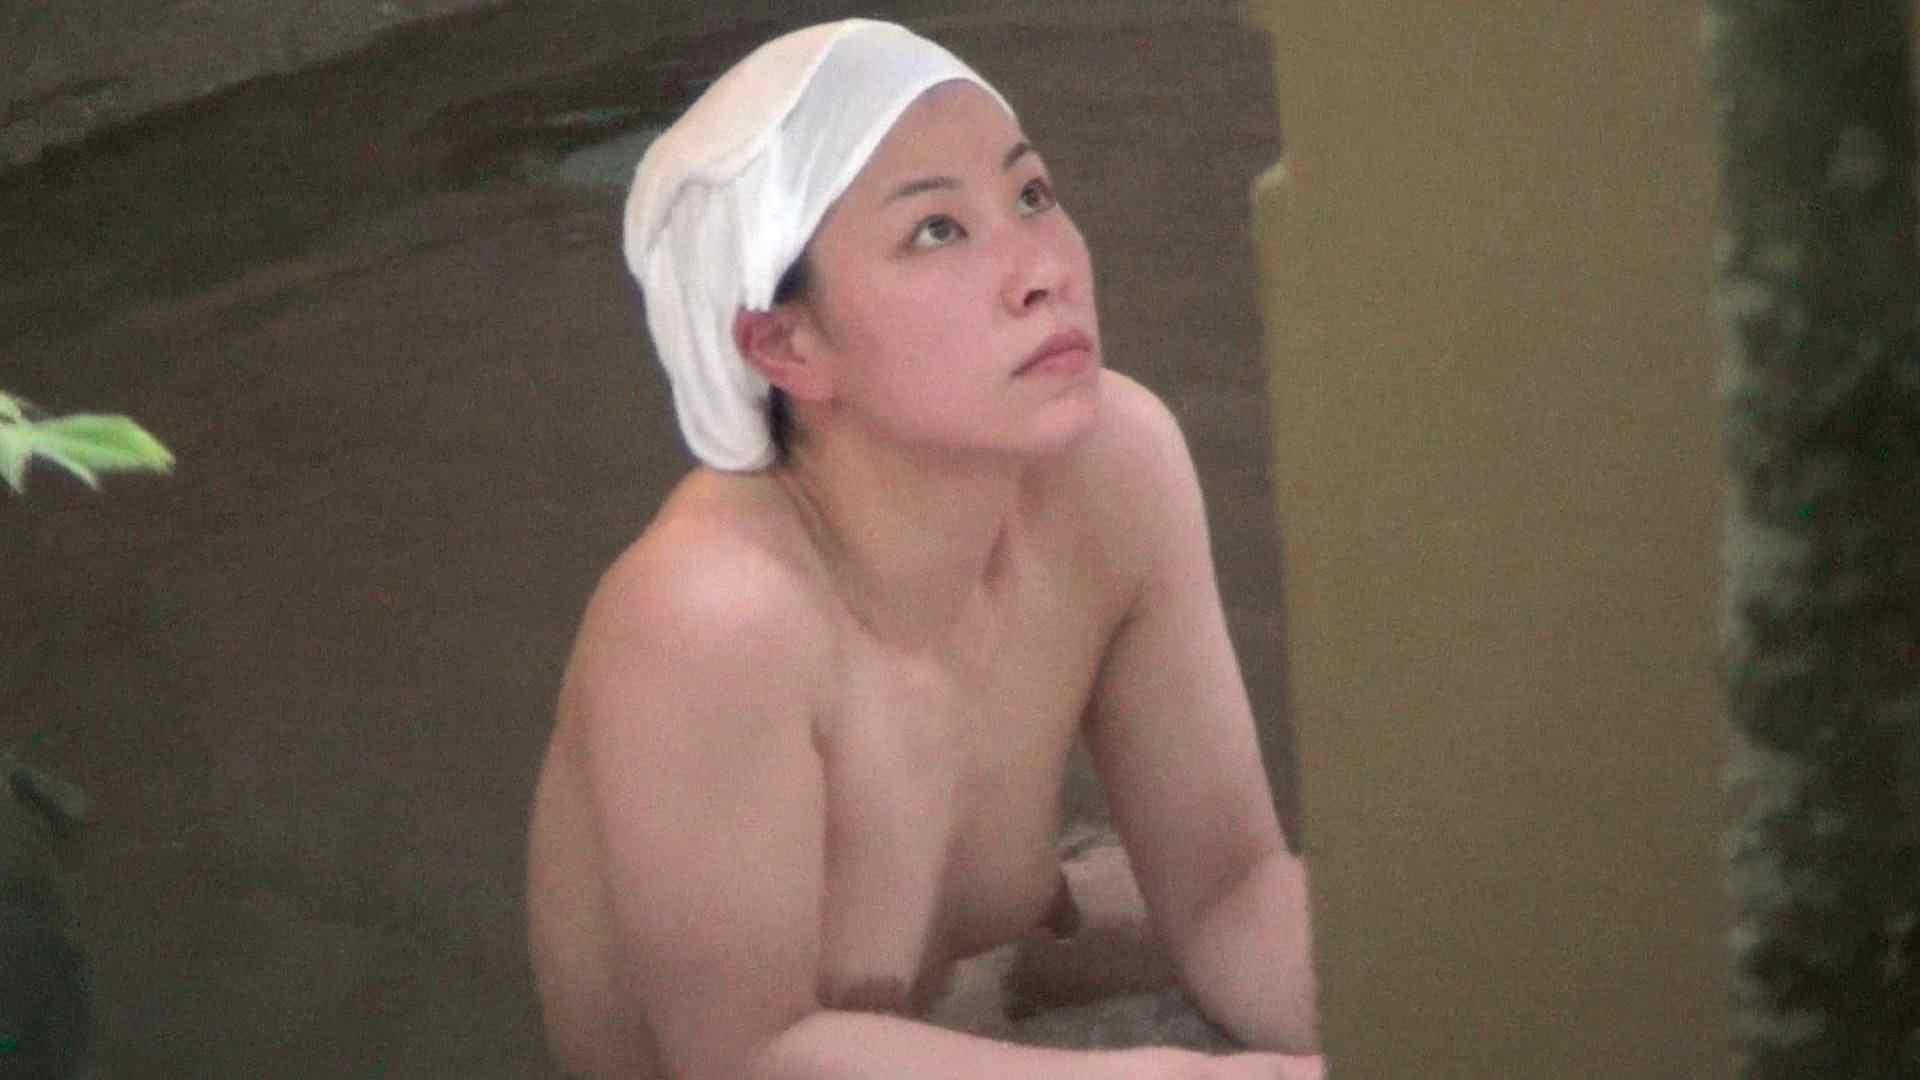 Aquaな露天風呂Vol.254 盗撮 すけべAV動画紹介 53画像 38